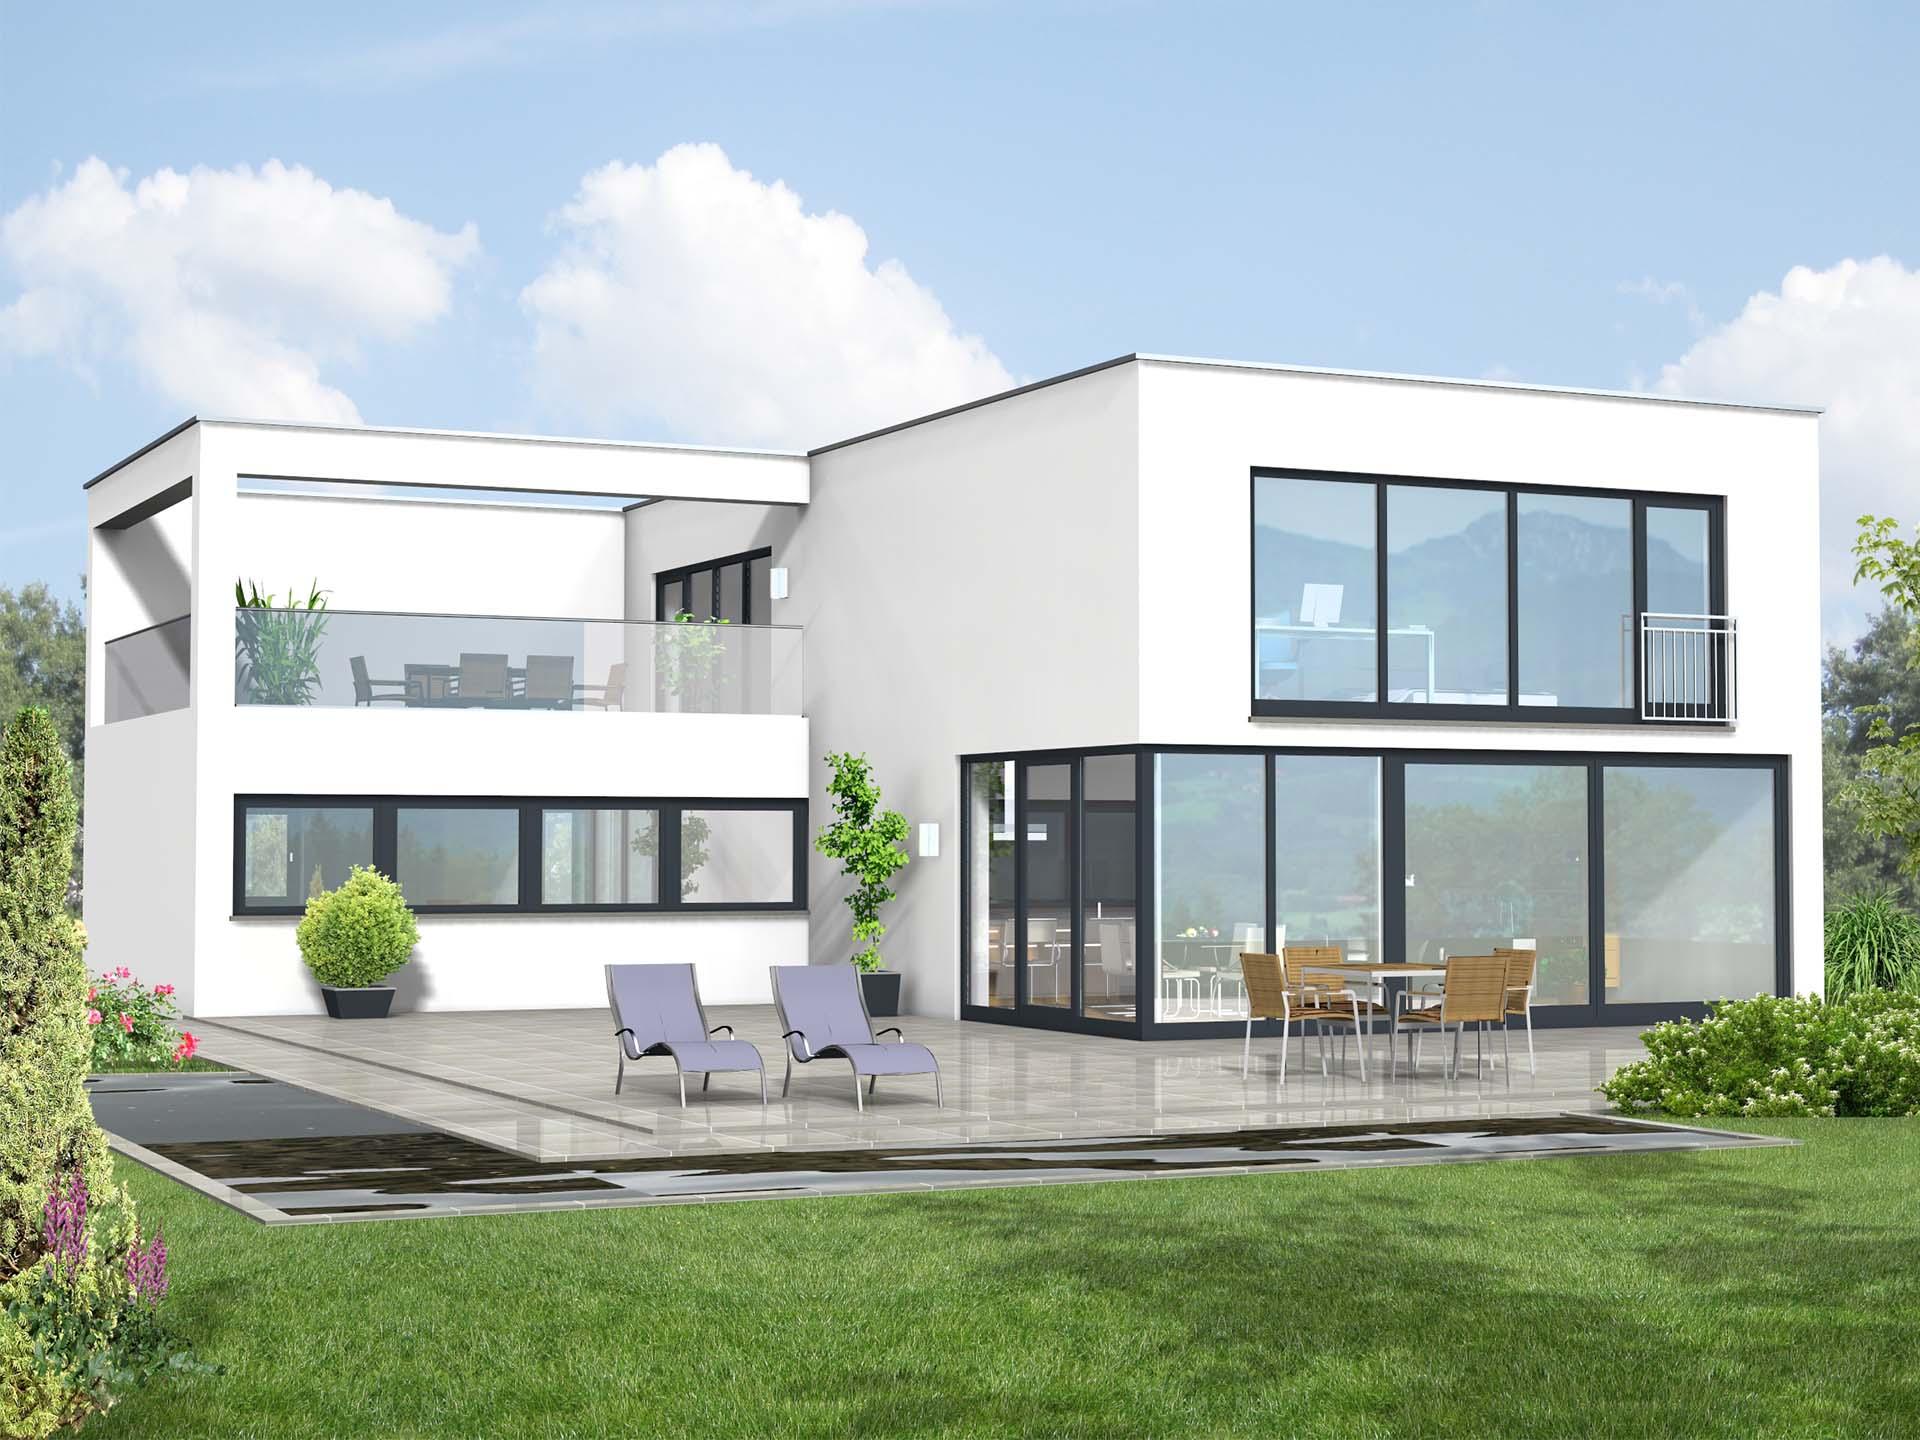 Projekt Hausbau PHB - Kubushaus